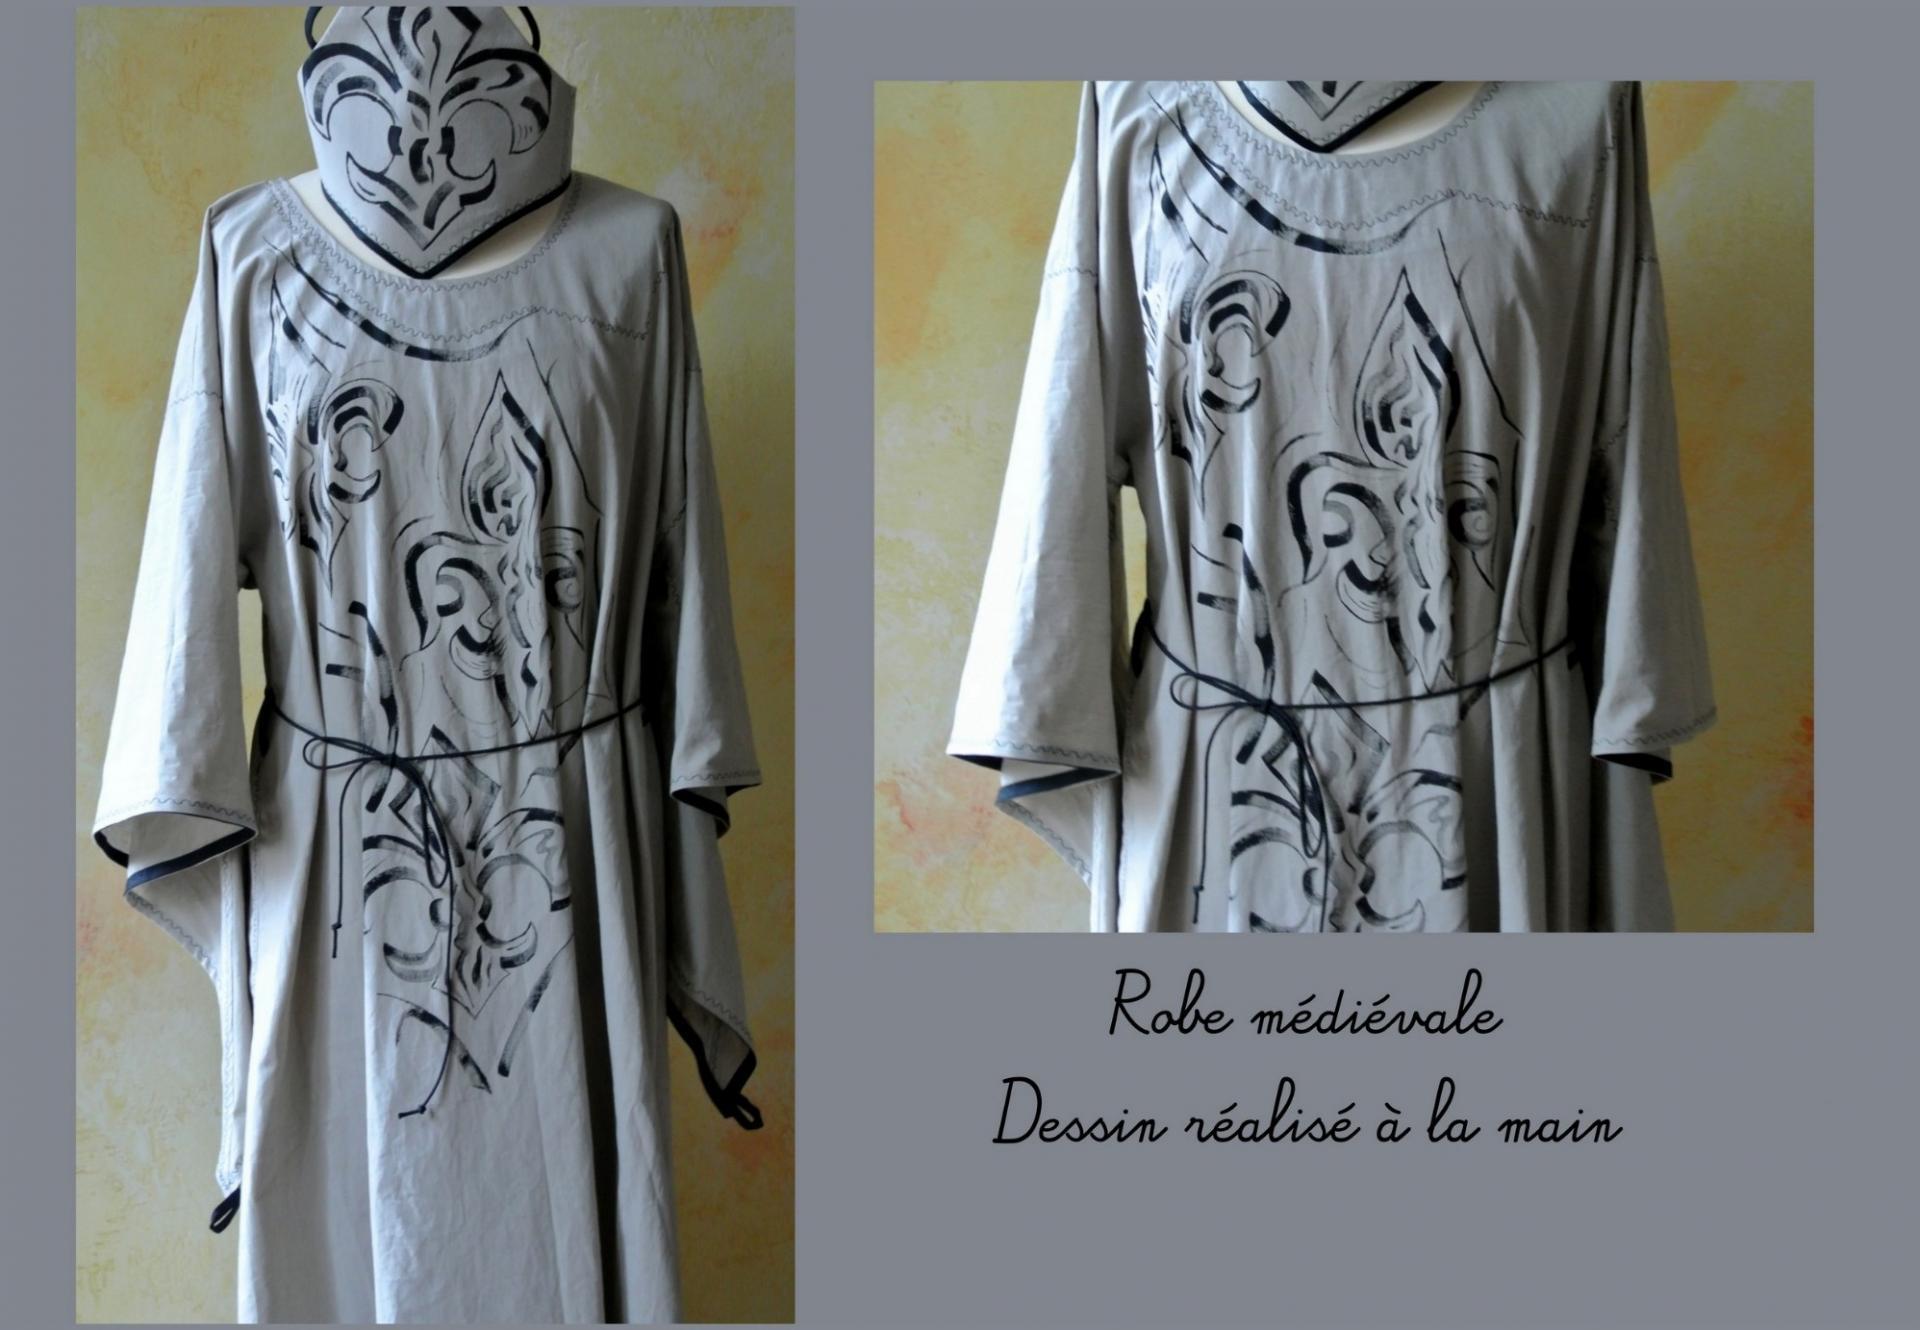 Robe peinte